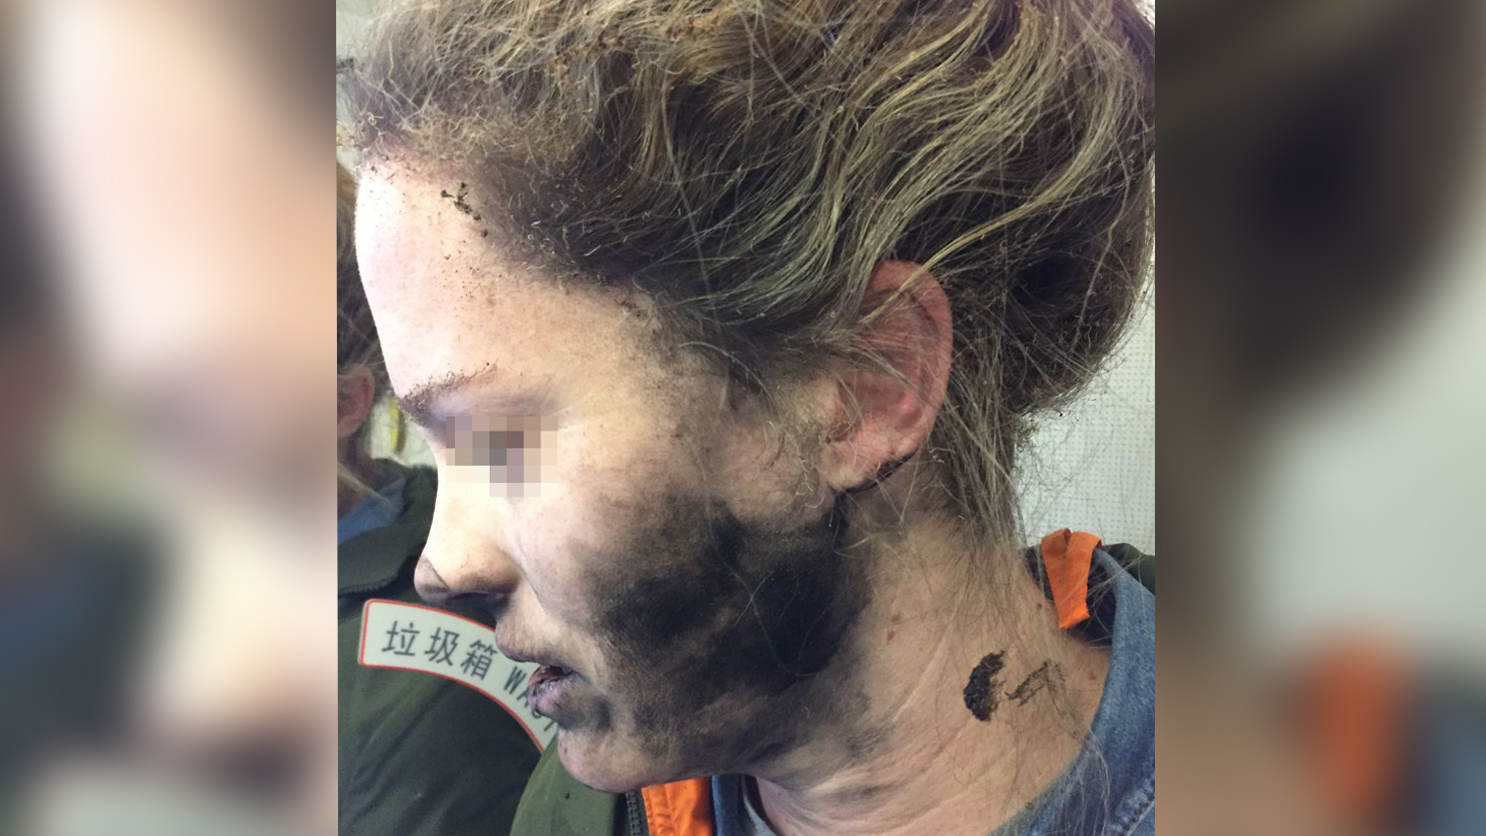 Aussie woman's headphones explode during flight